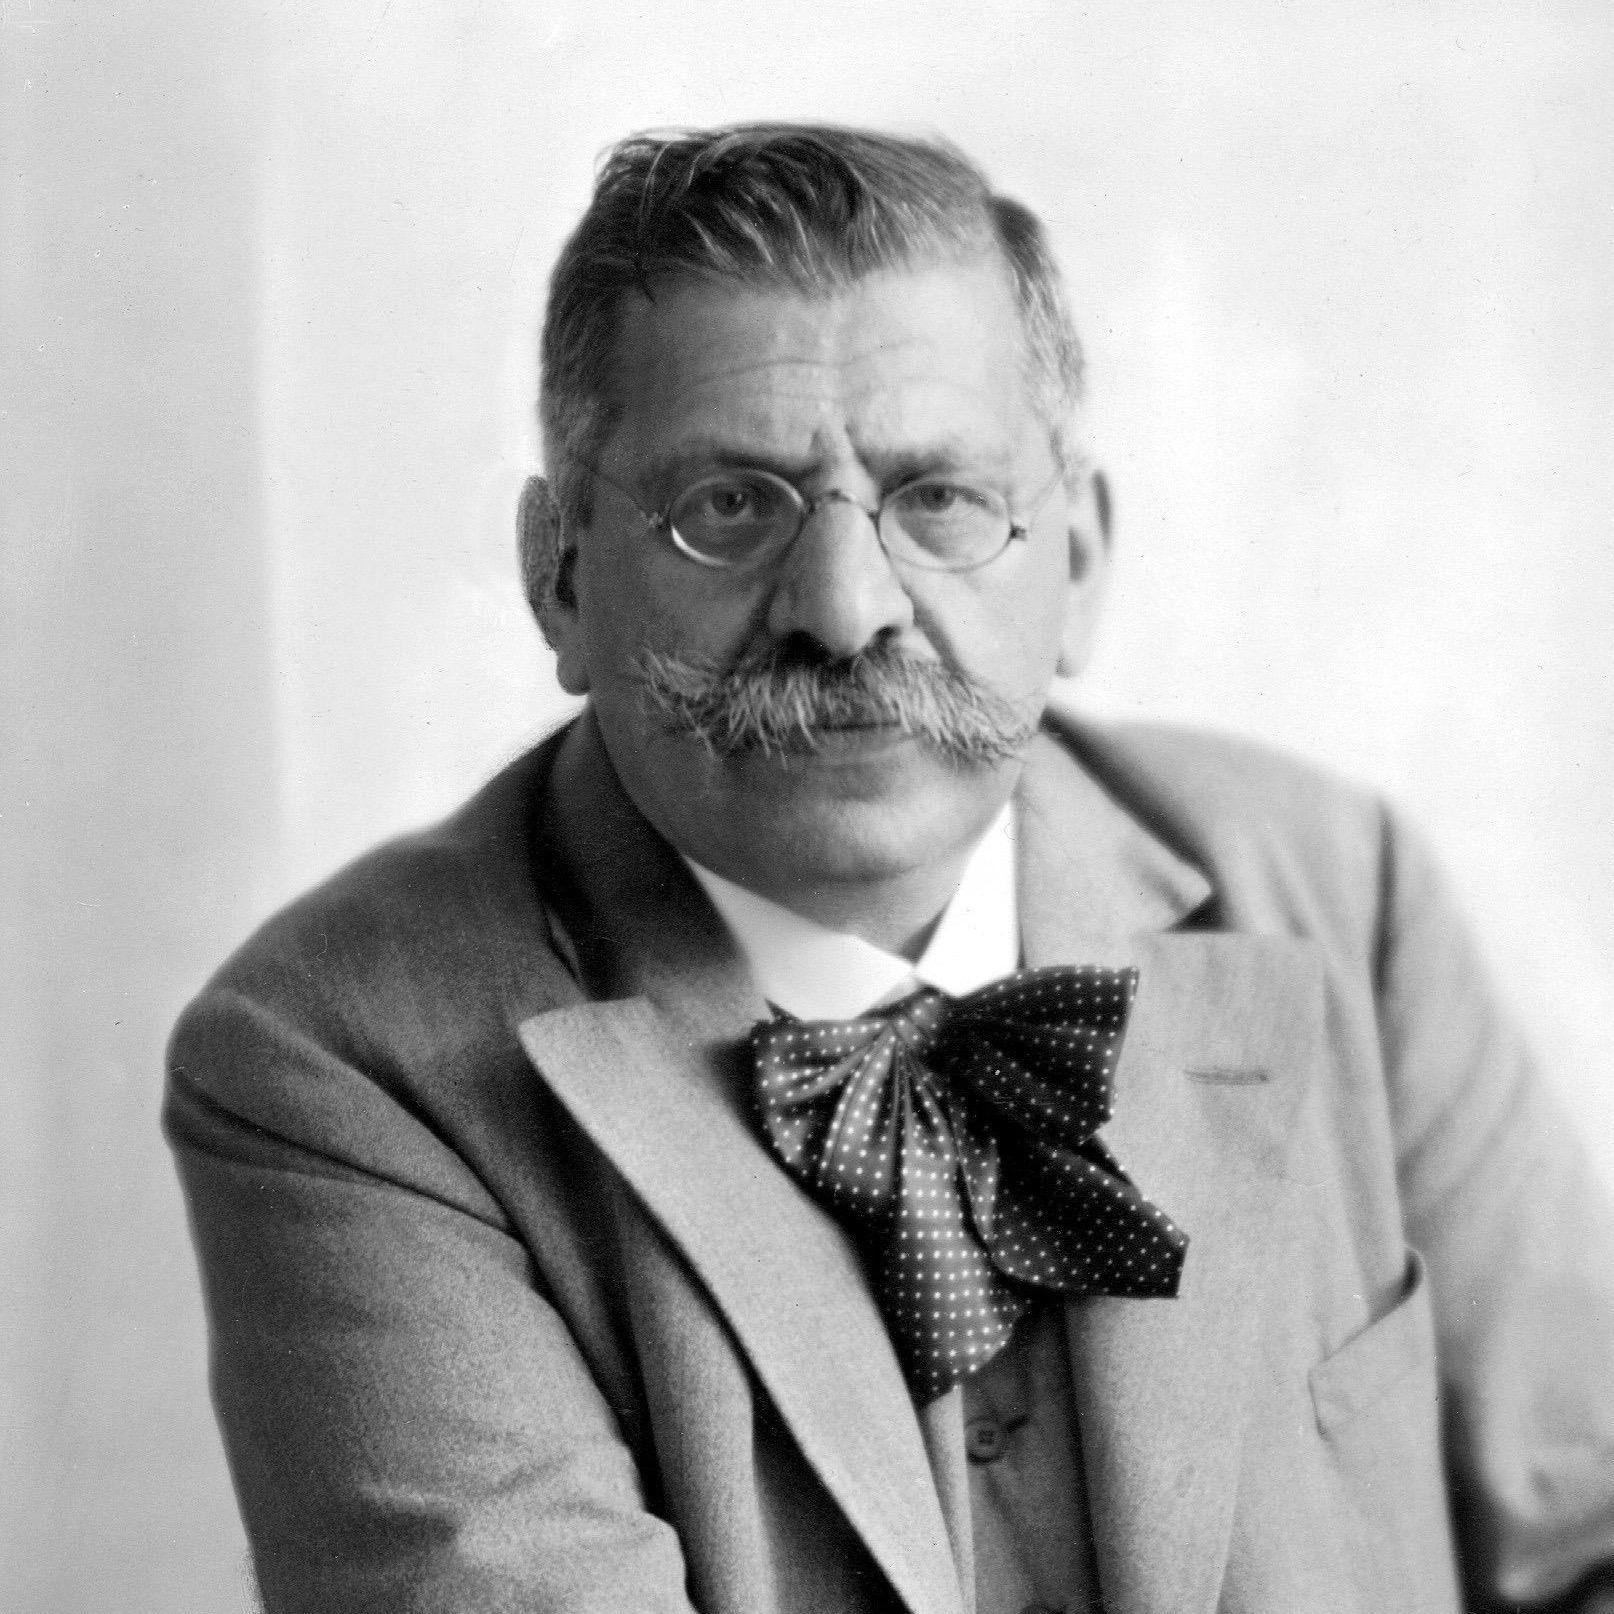 Hirschfeld-portrait-xlg.jpg